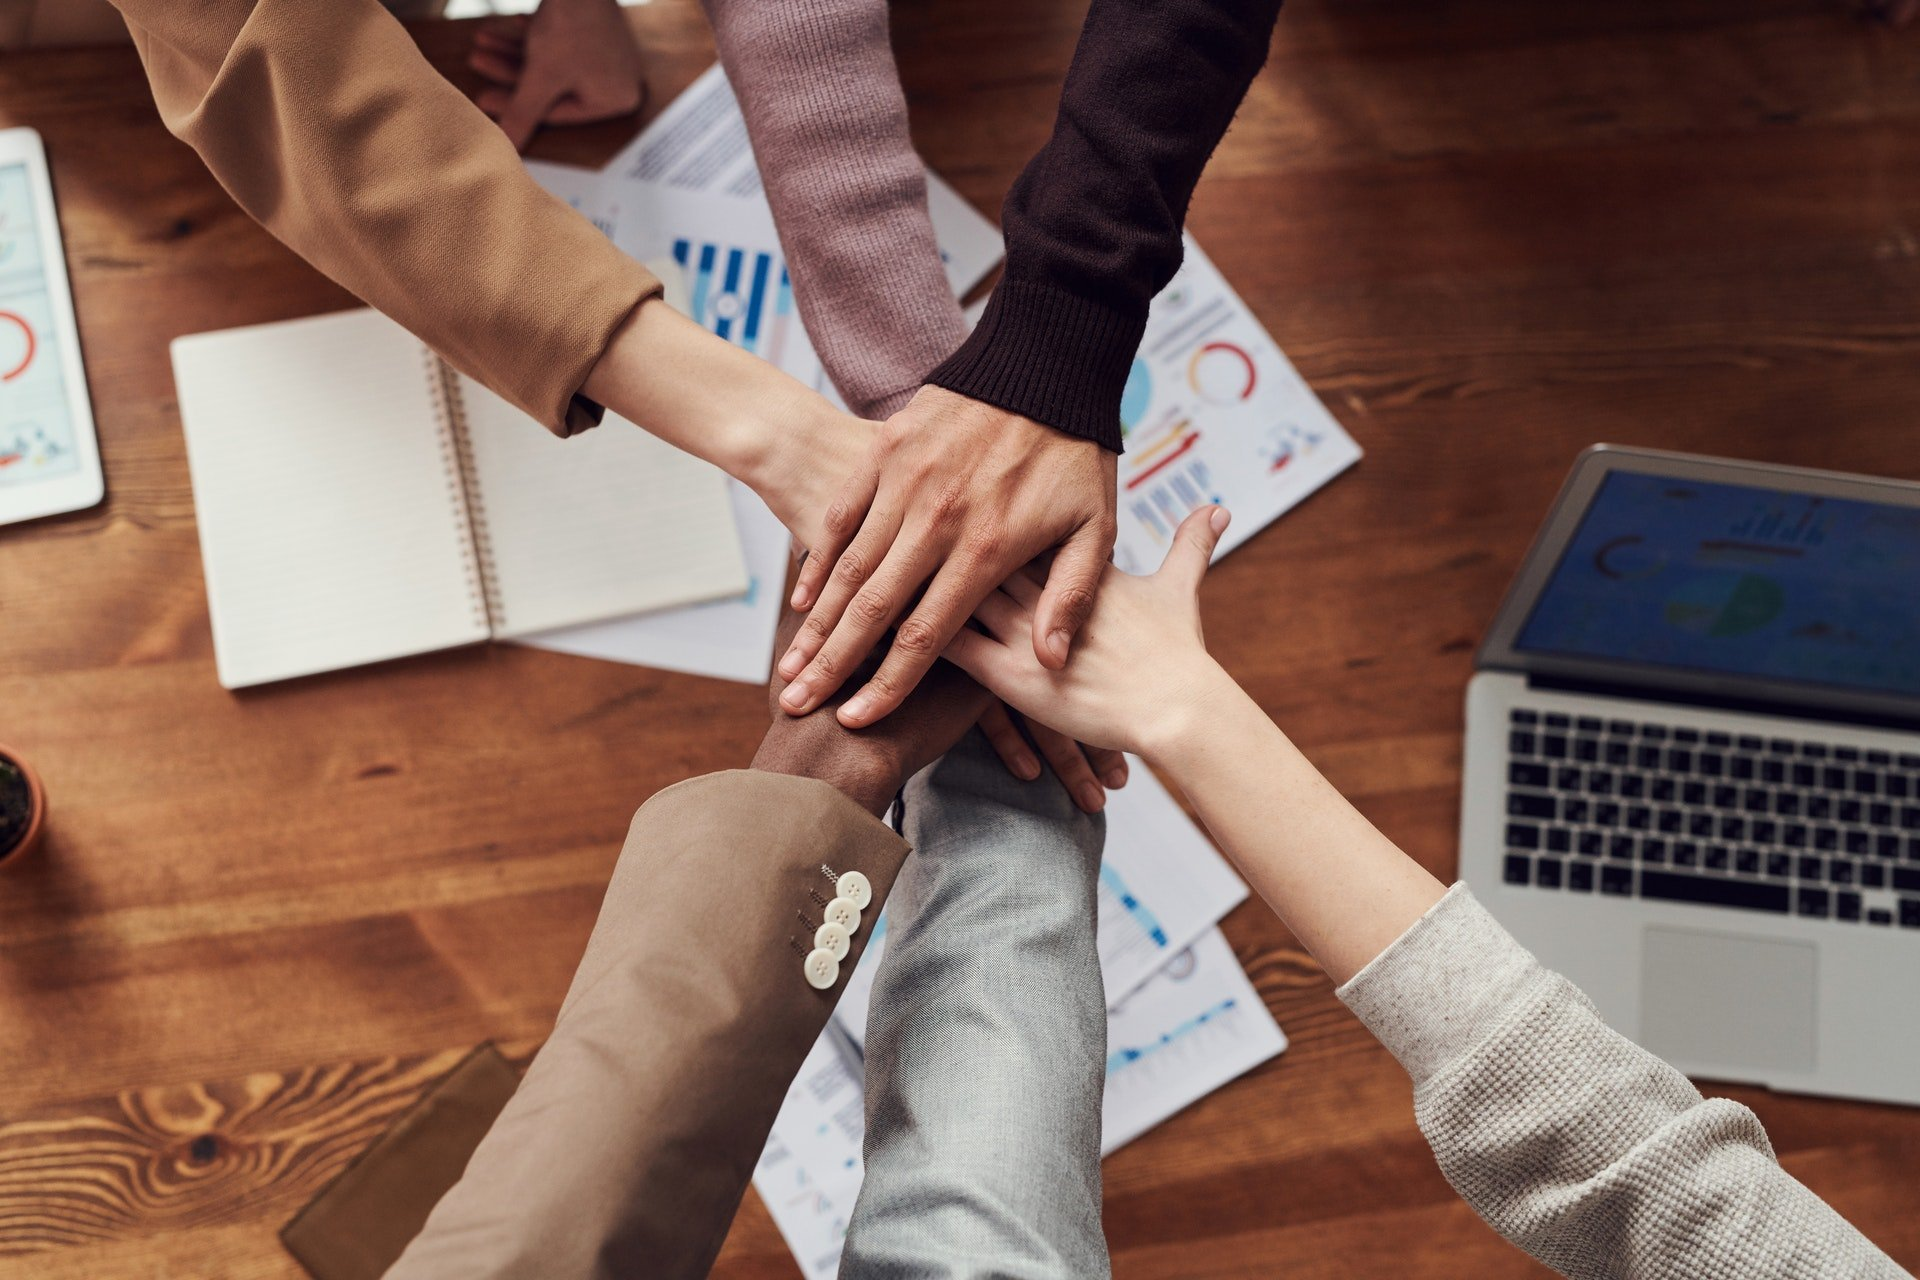 Cooperation: Teamwork